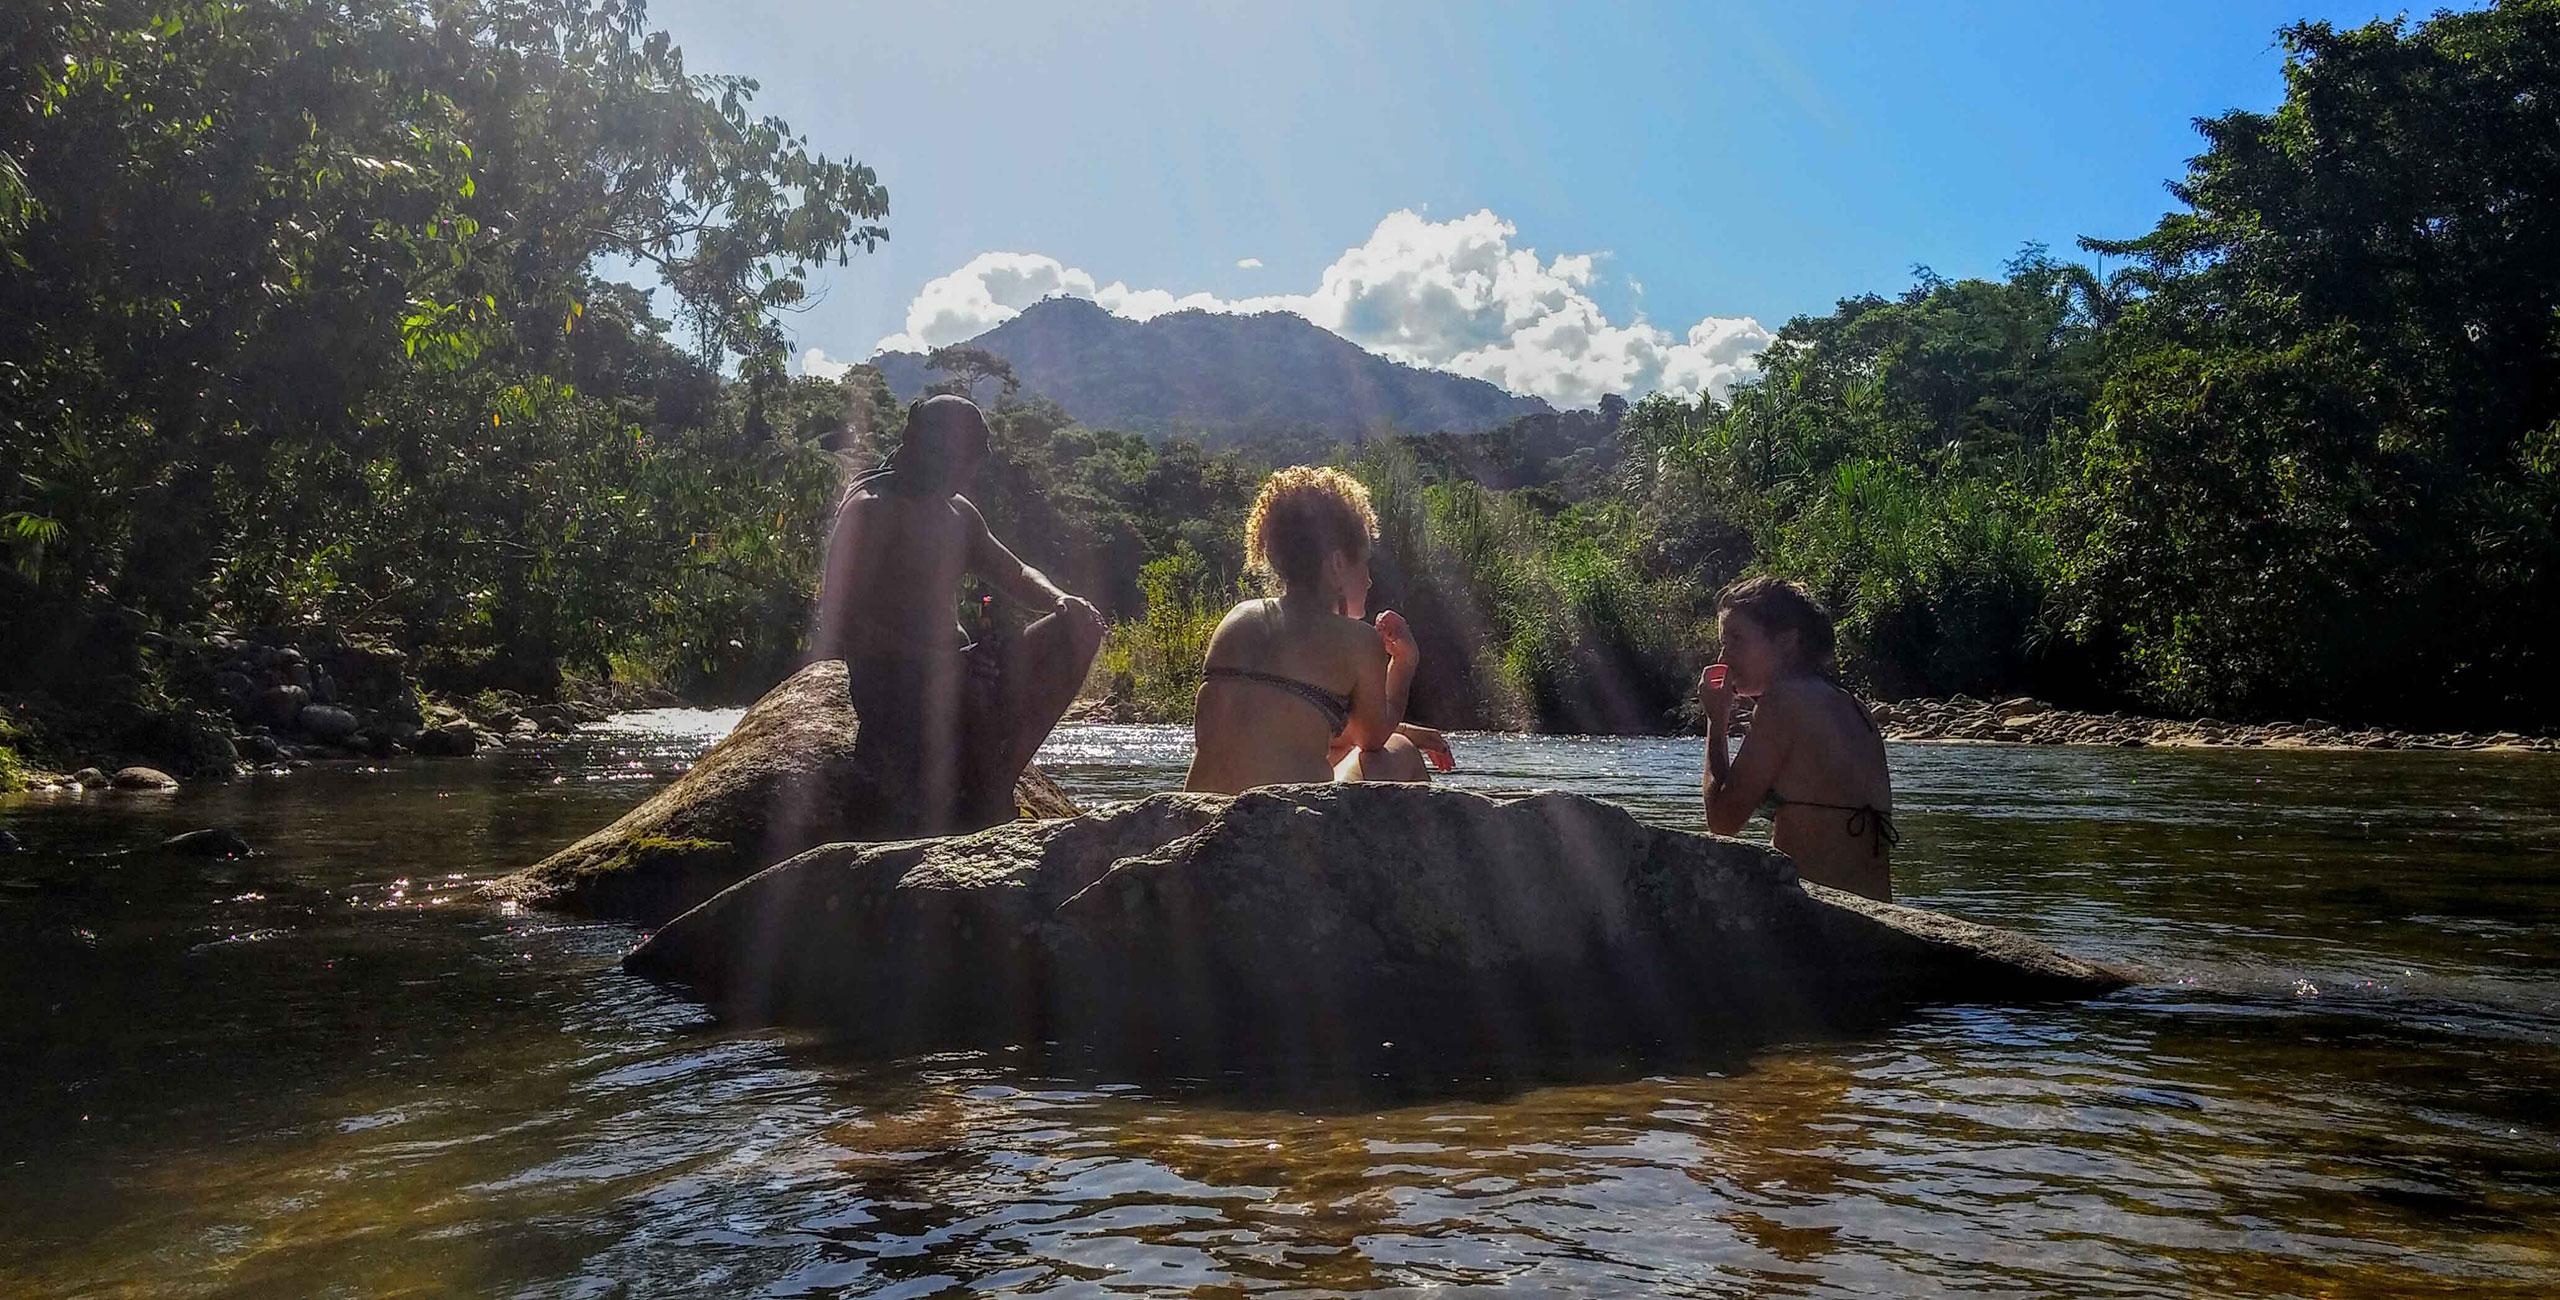 river-chillin in Ecuador